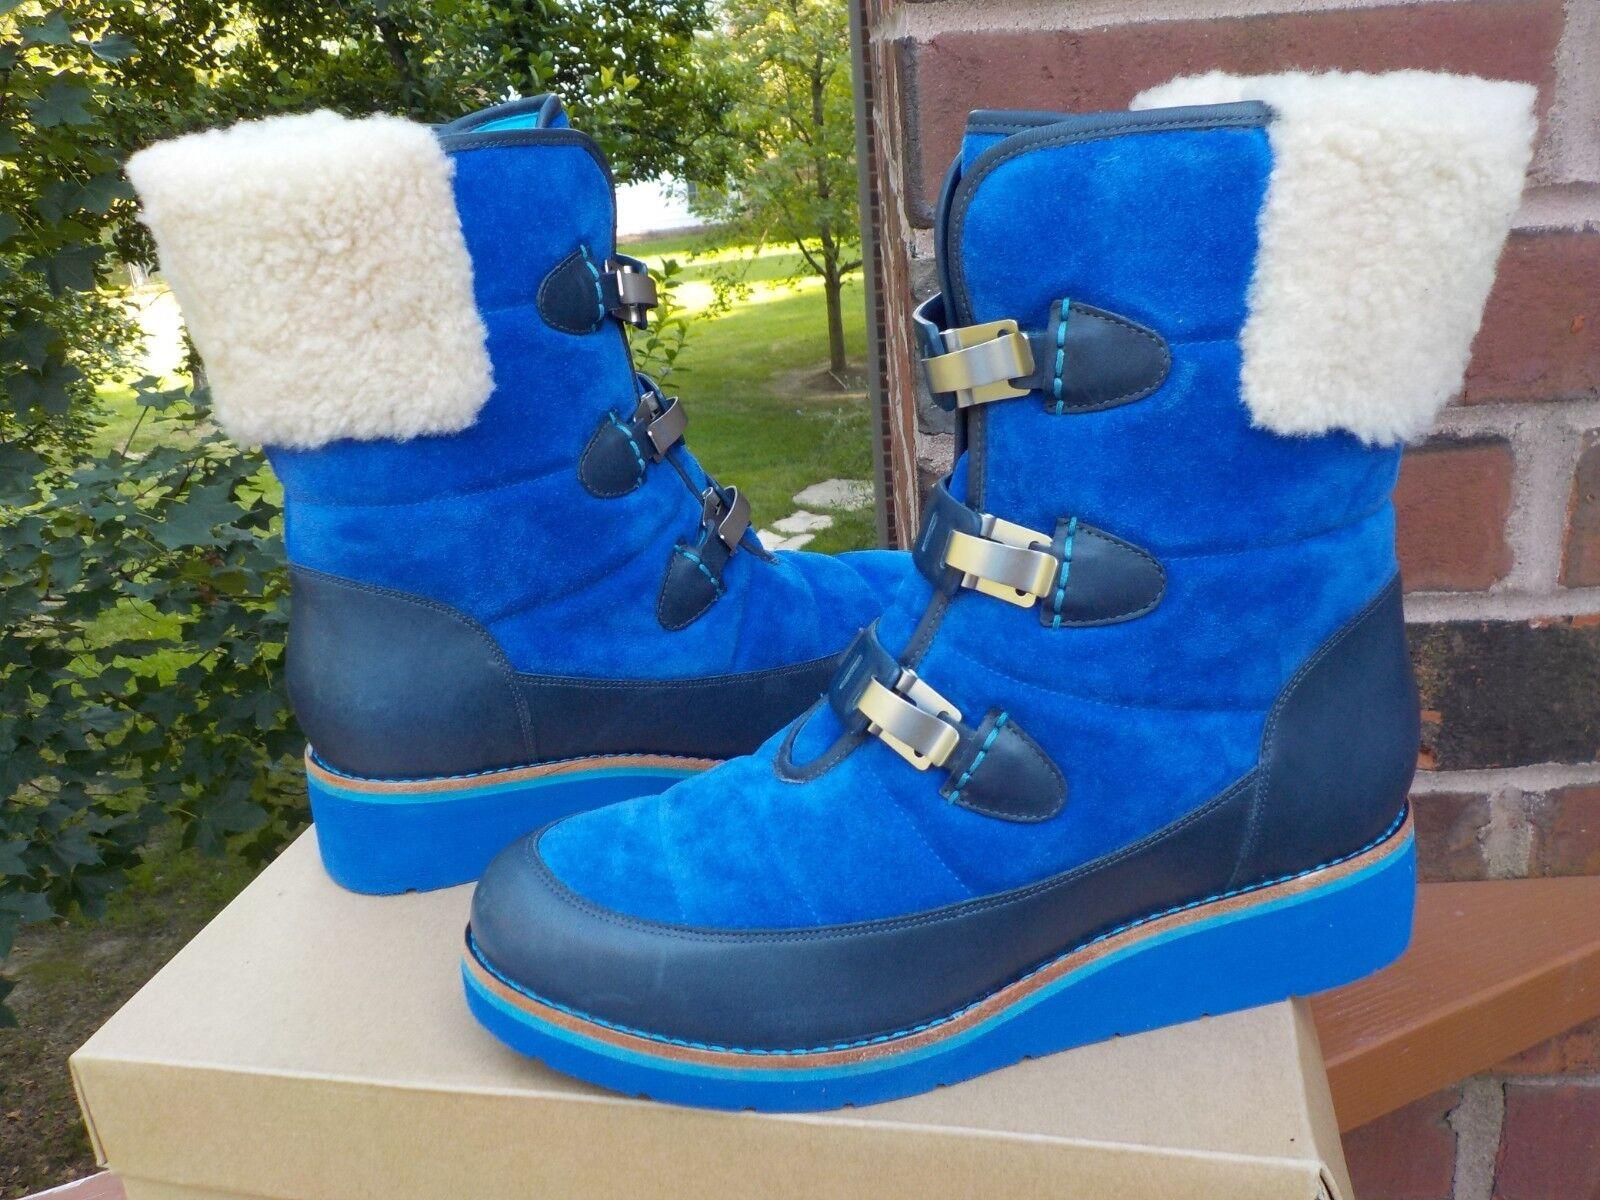 NIB Cole Haan Lania Short Boot bluee Suede Waterproof Fur WOMEN'S Size 8.5